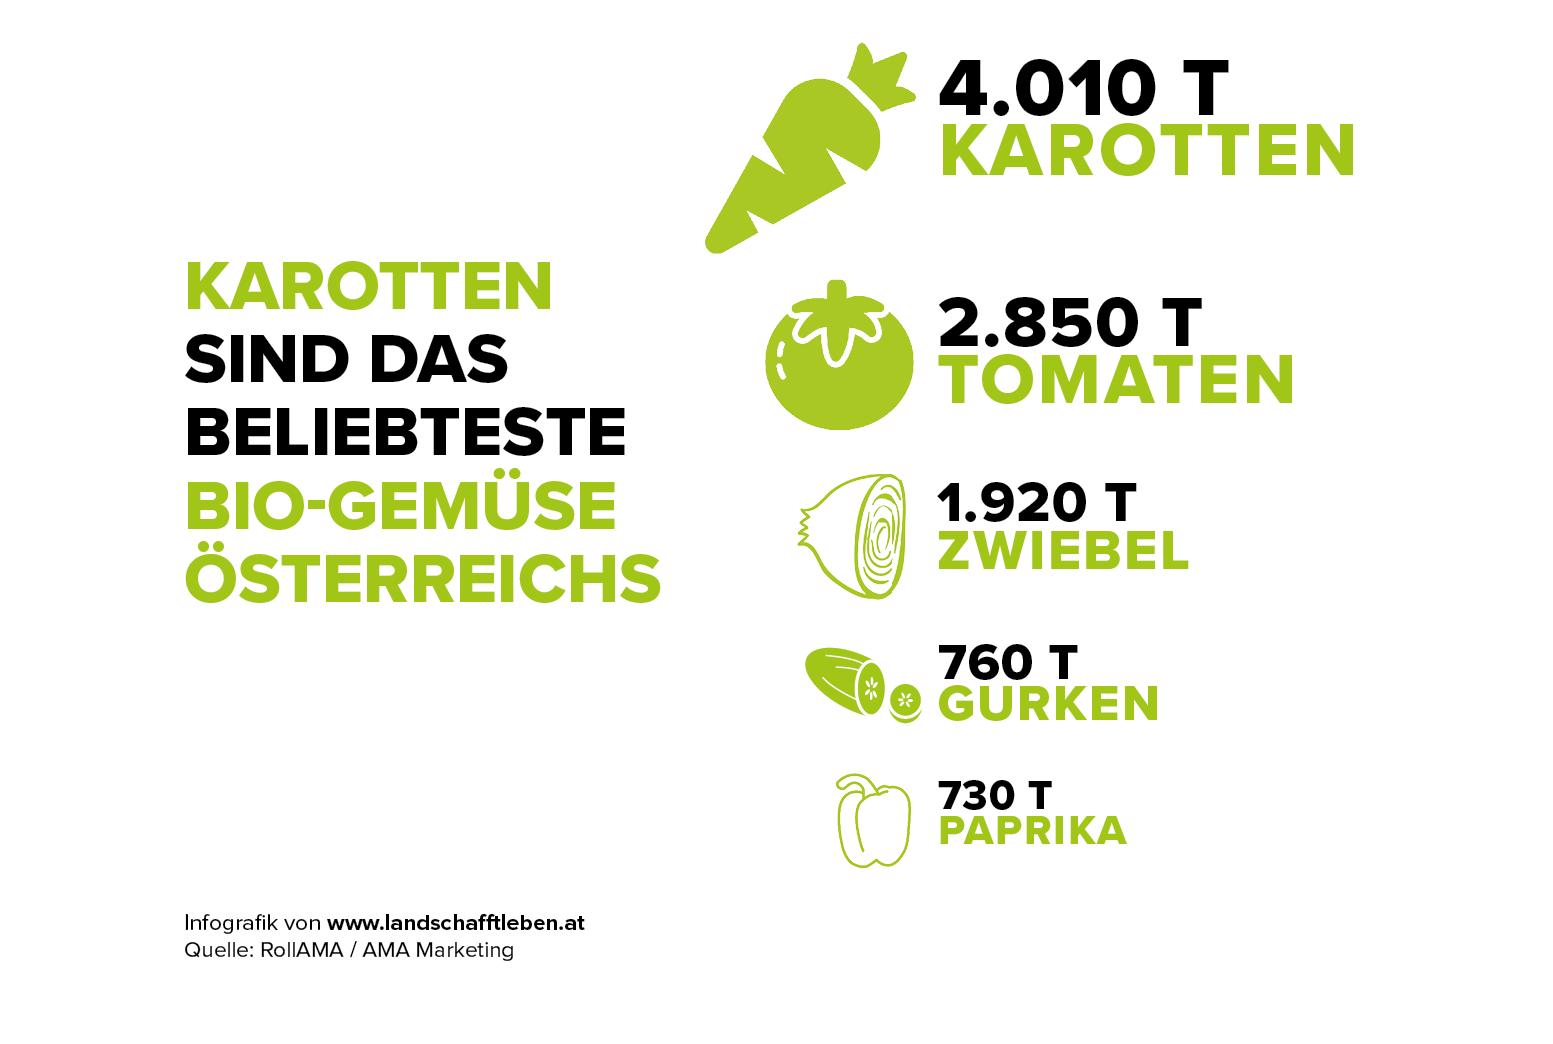 infografik-karotte-top-5-bio-gemuse-c-land-schafft-leben-2017